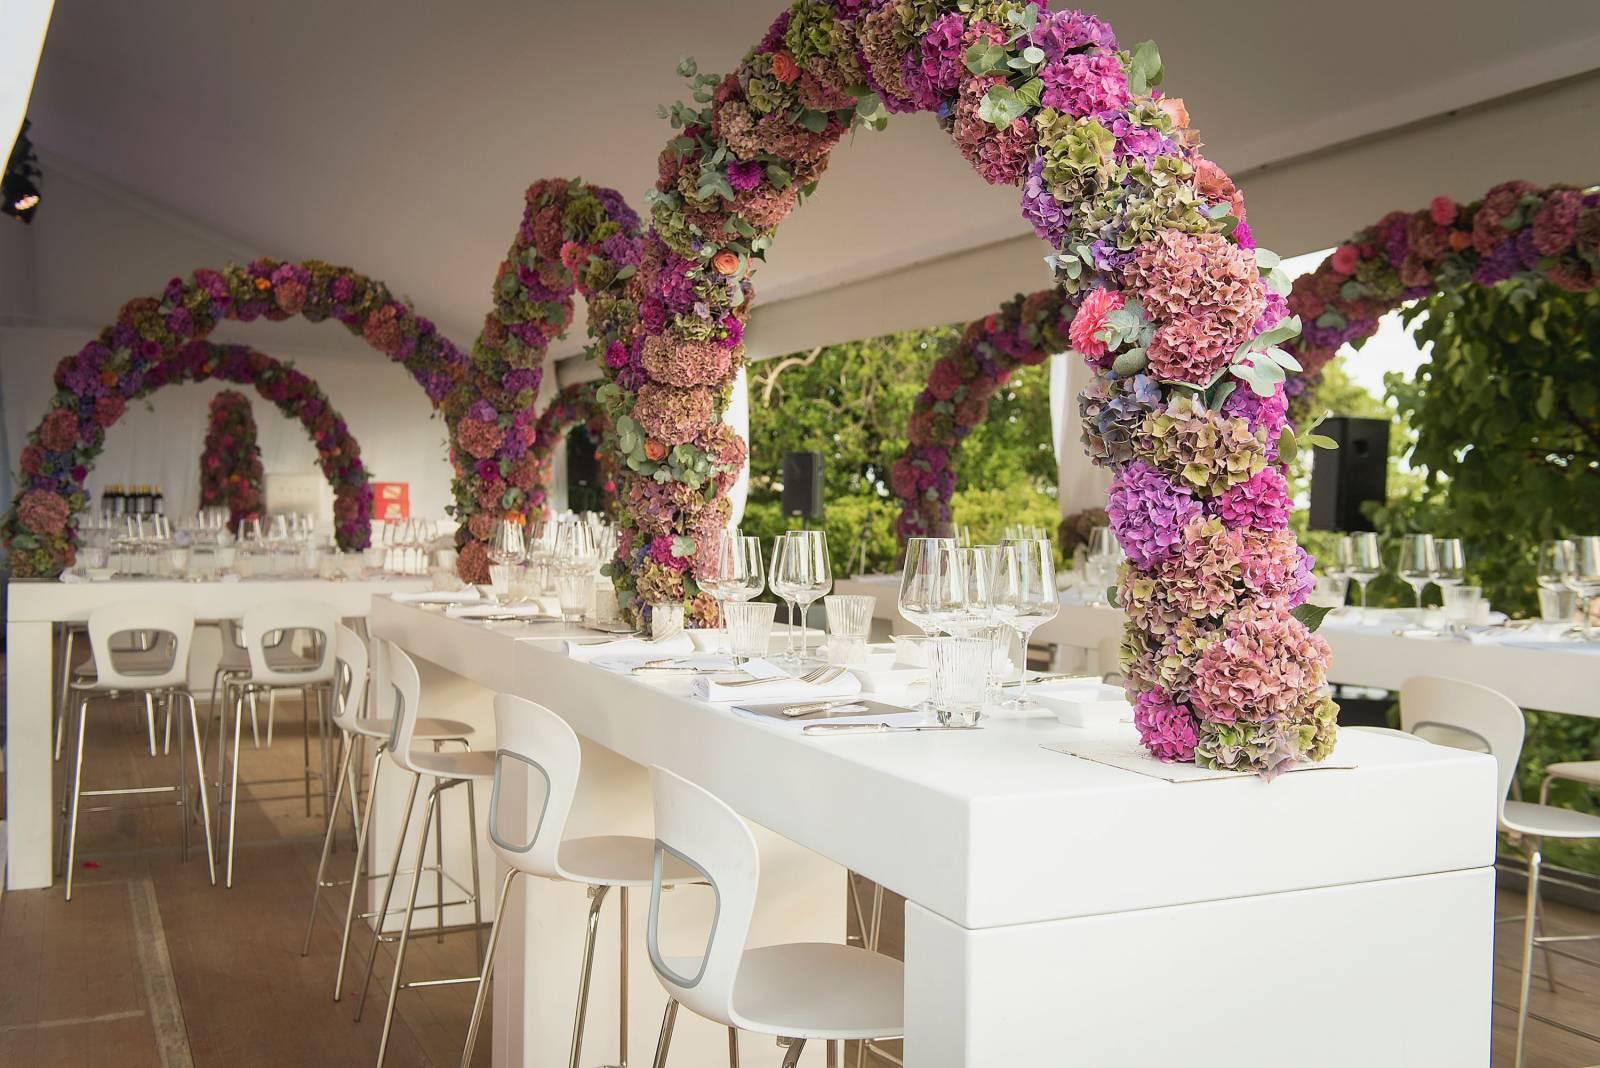 Feriatus - Wedding planner - House of Weddings  - 1